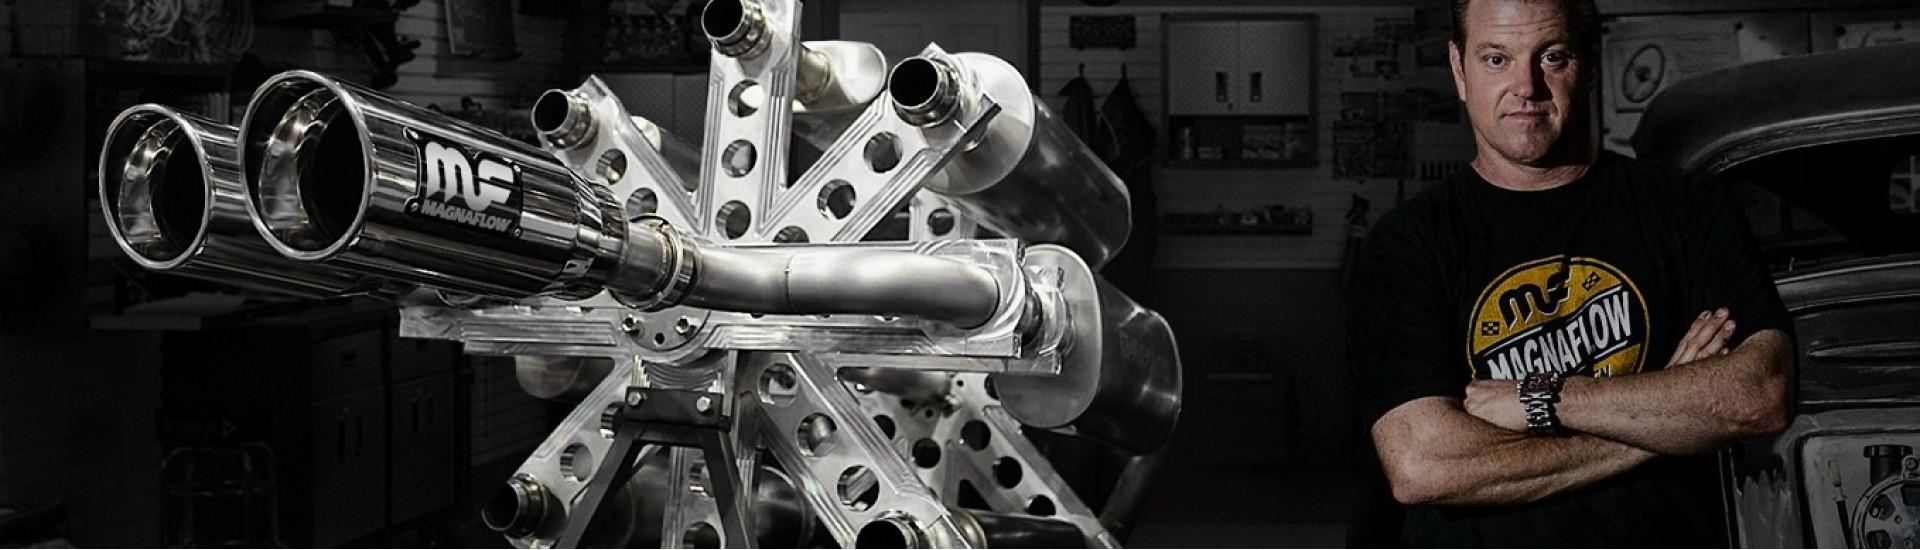 قطعات اسپرت ، قیمت قطعات اسپرت ، performance parts